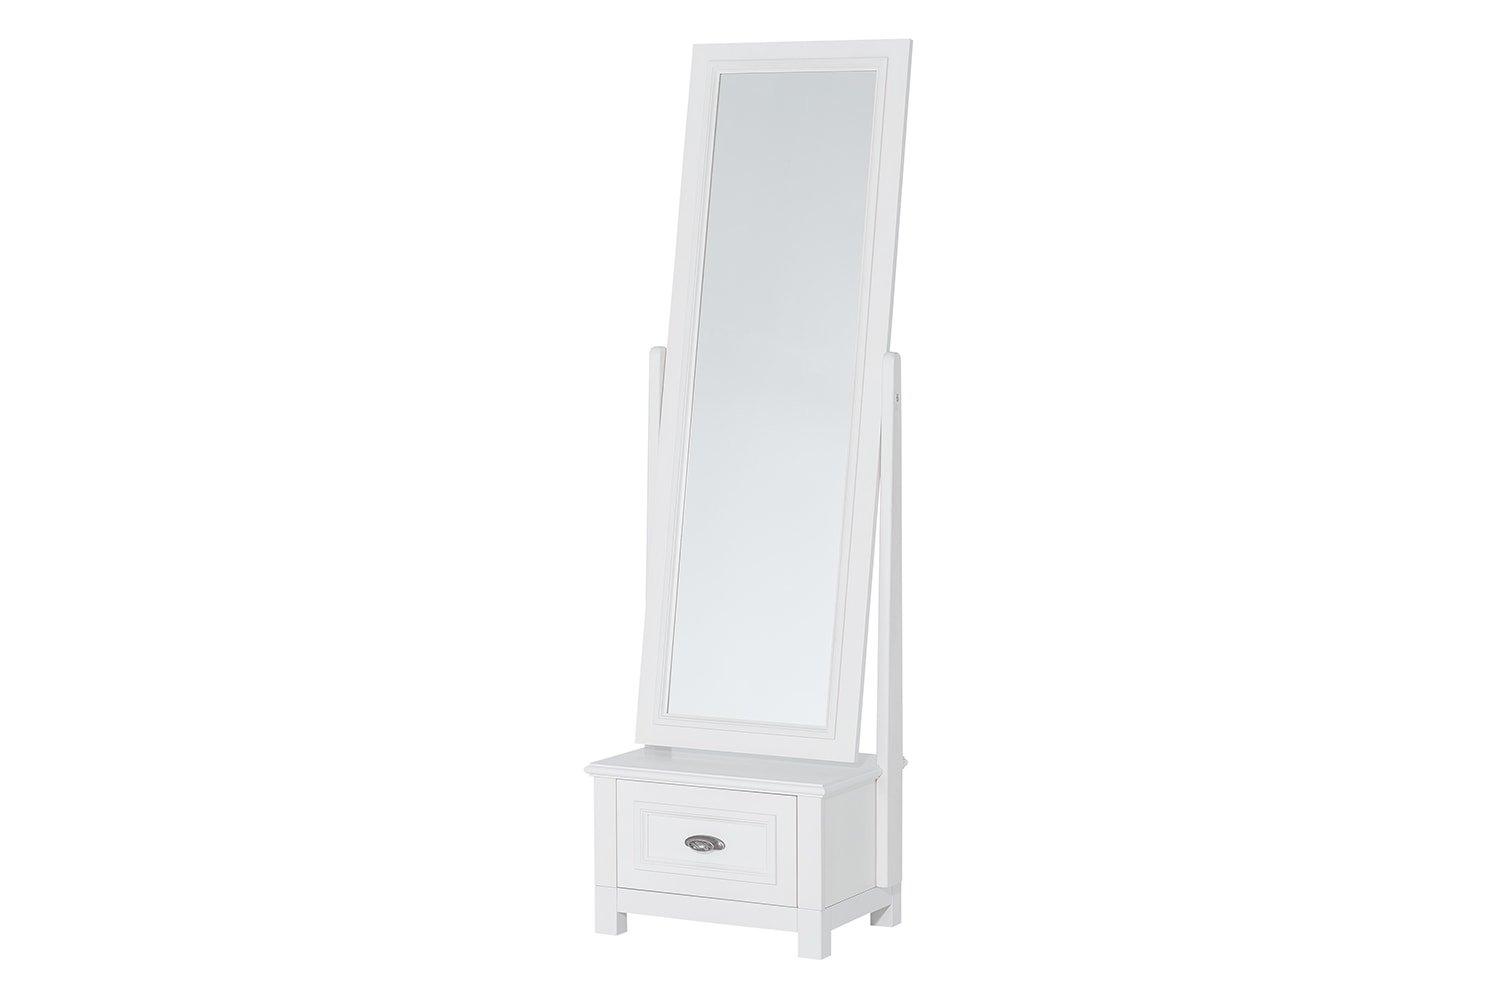 Oglinda decorativa din furnir si pal, cu 1 sertar Madison 70 Alb, l52xA41xH177 cm poza